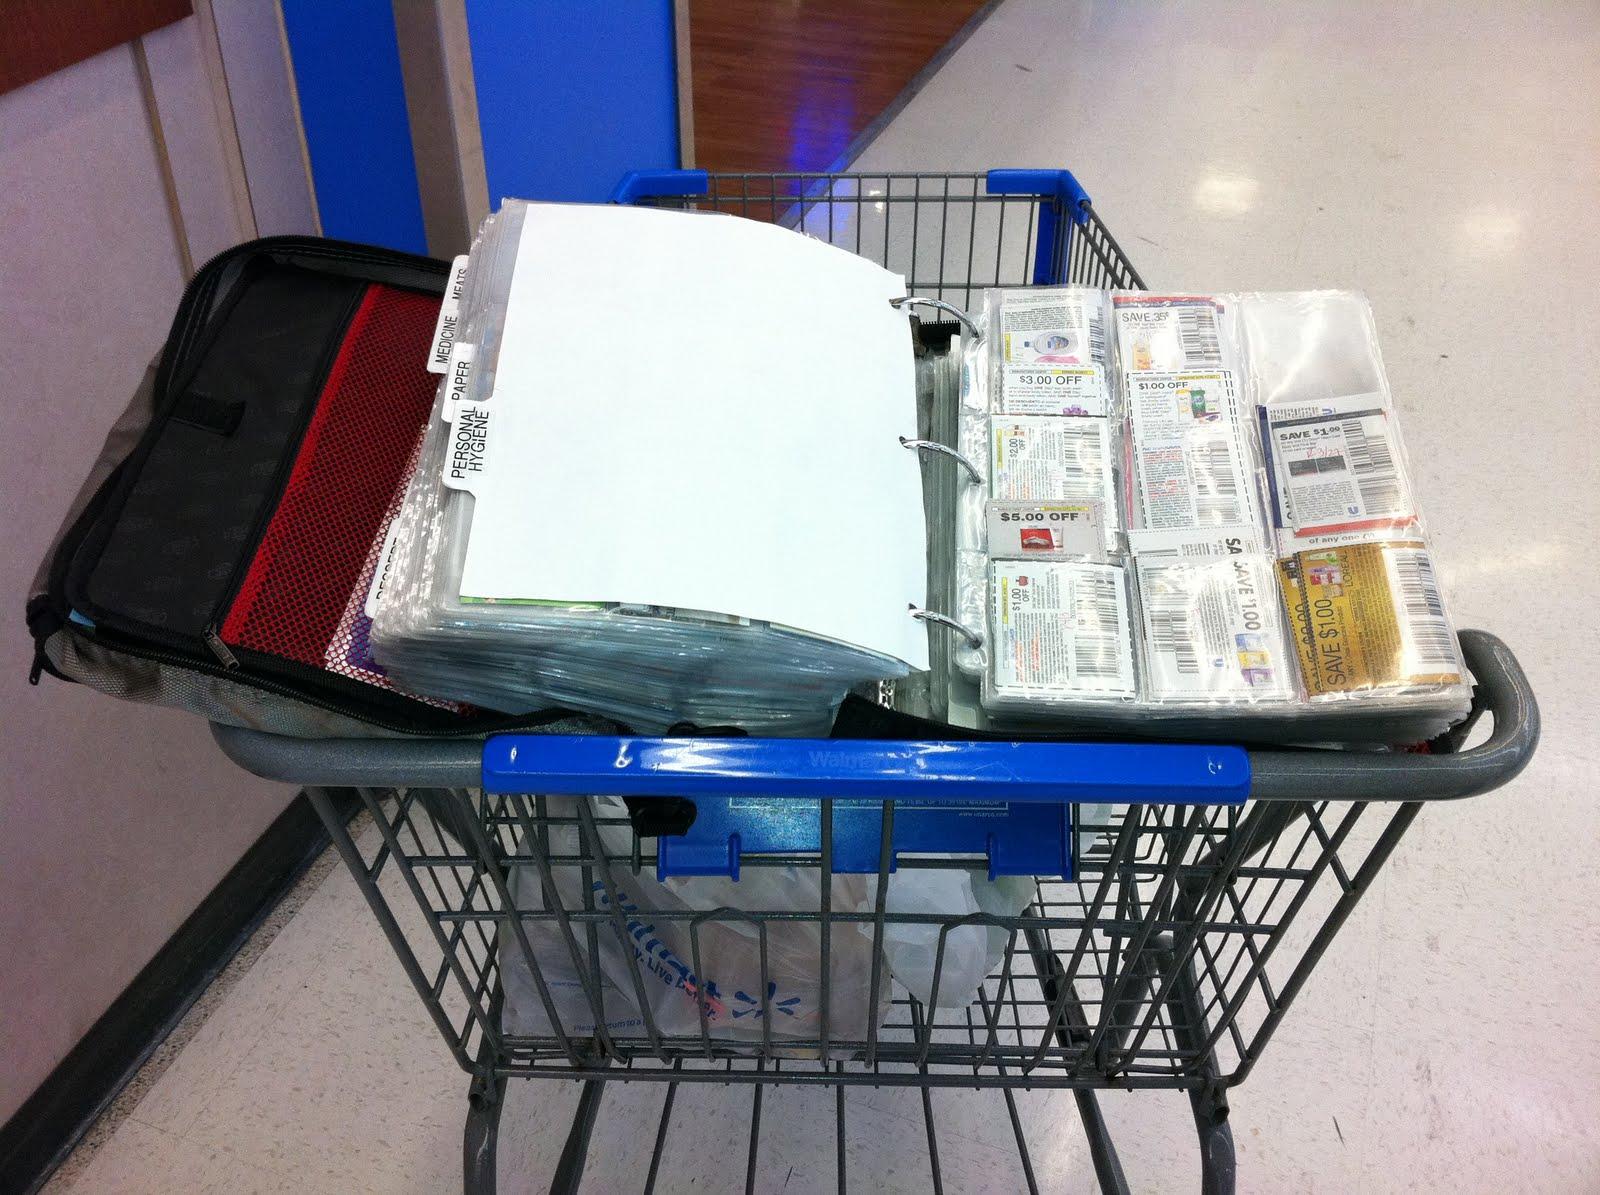 Coupon master clipping service - A Savvy Tip Coupon Binder Shopping Cart Trick